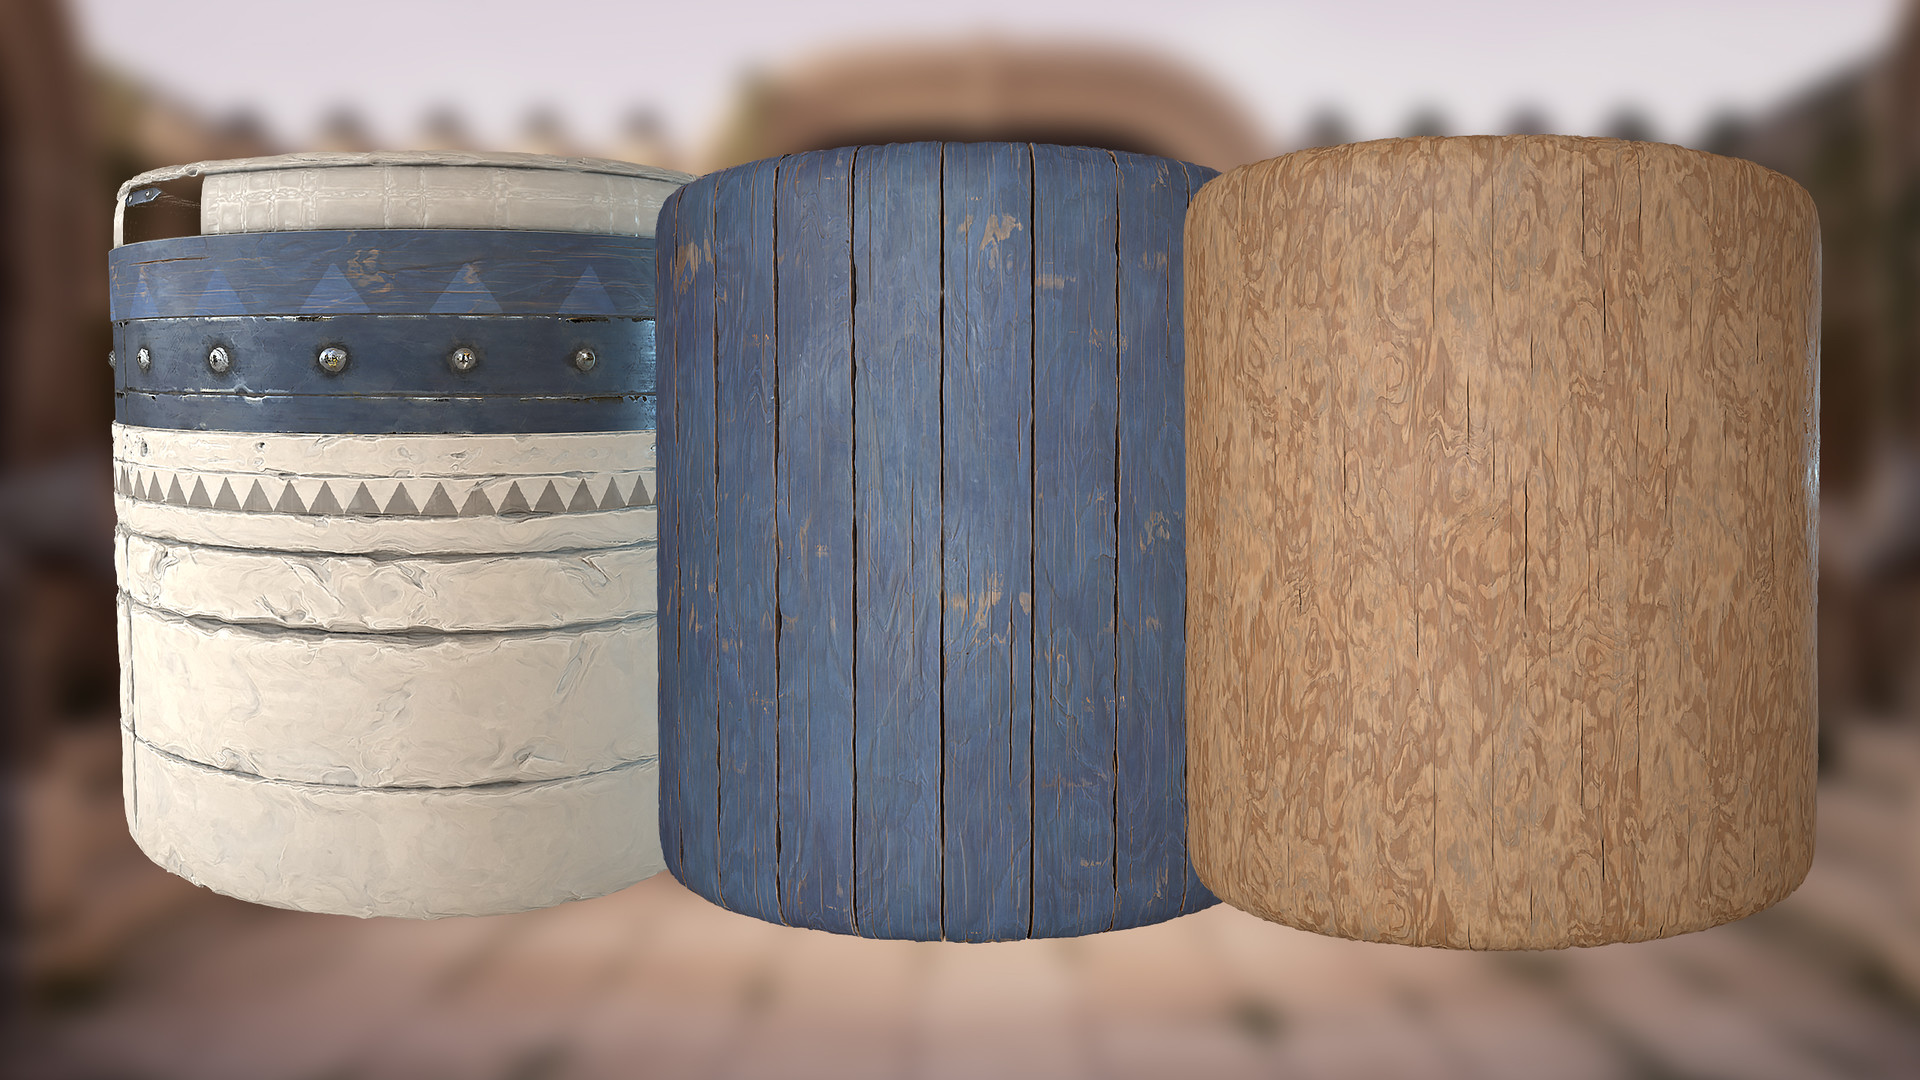 Johan qvarfordt fantasygate render materials 02